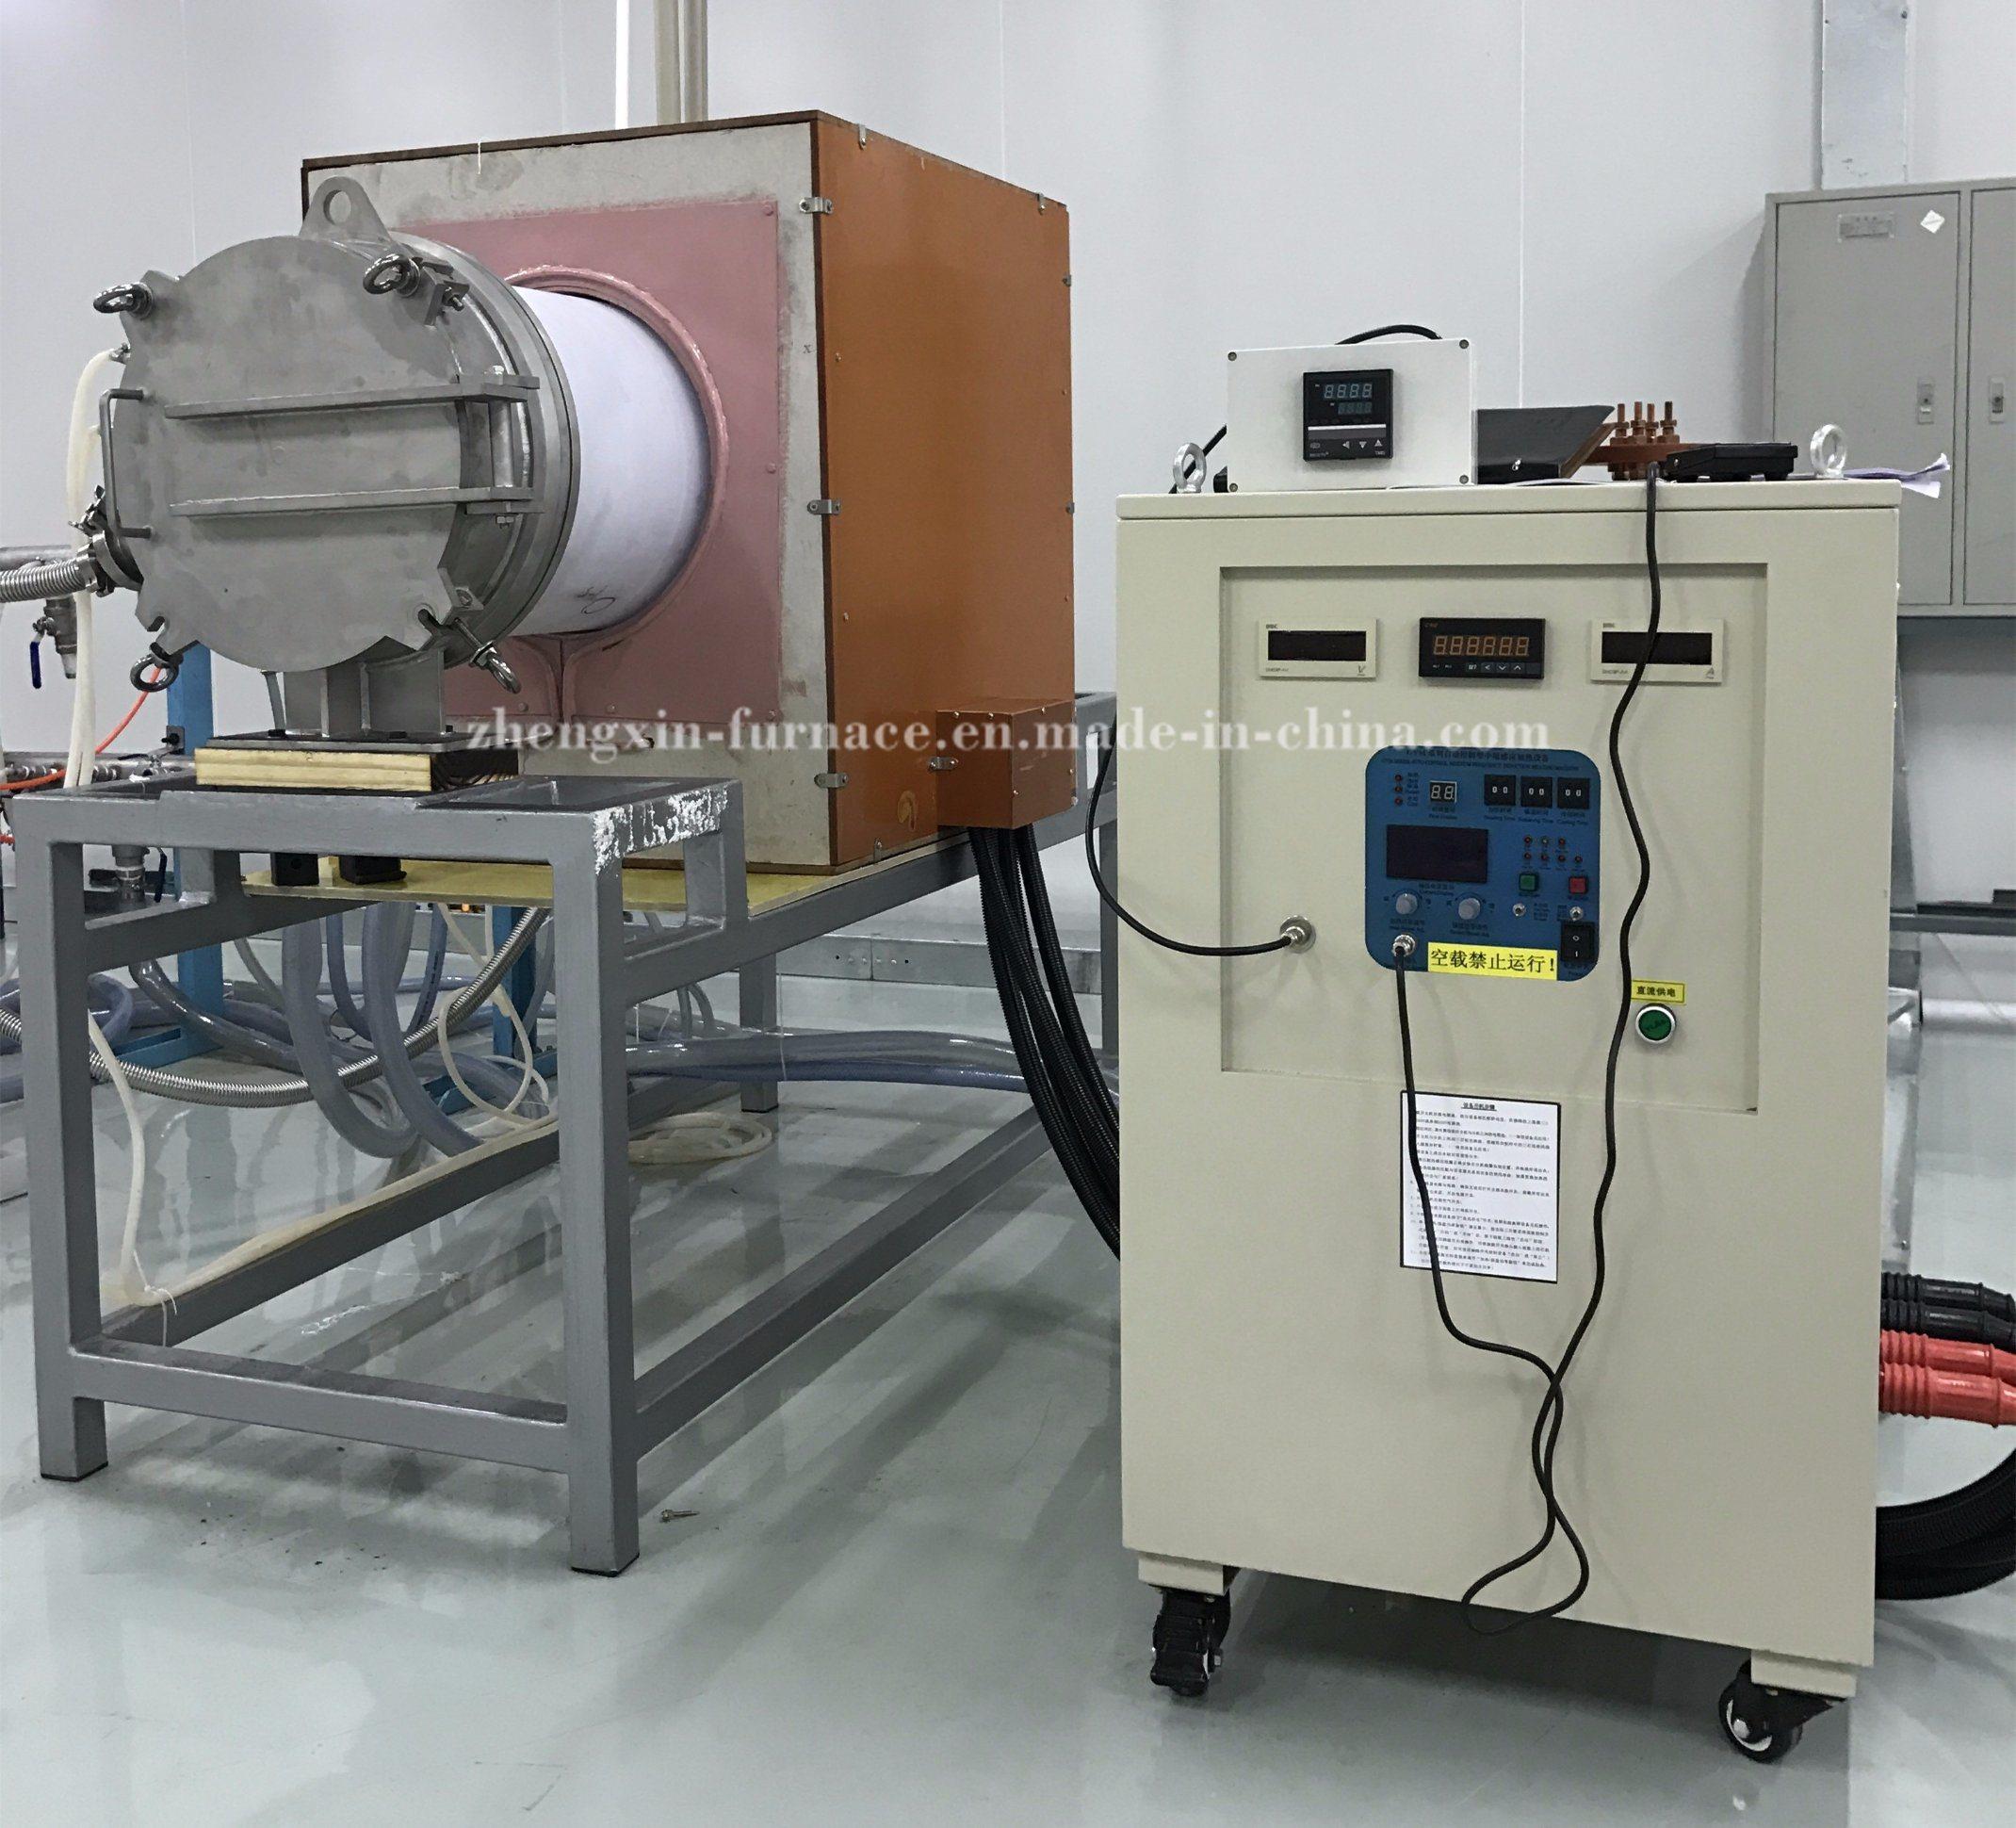 China Induction Heater Medium Frequency Igbt Heating Iii With Machine 120kw